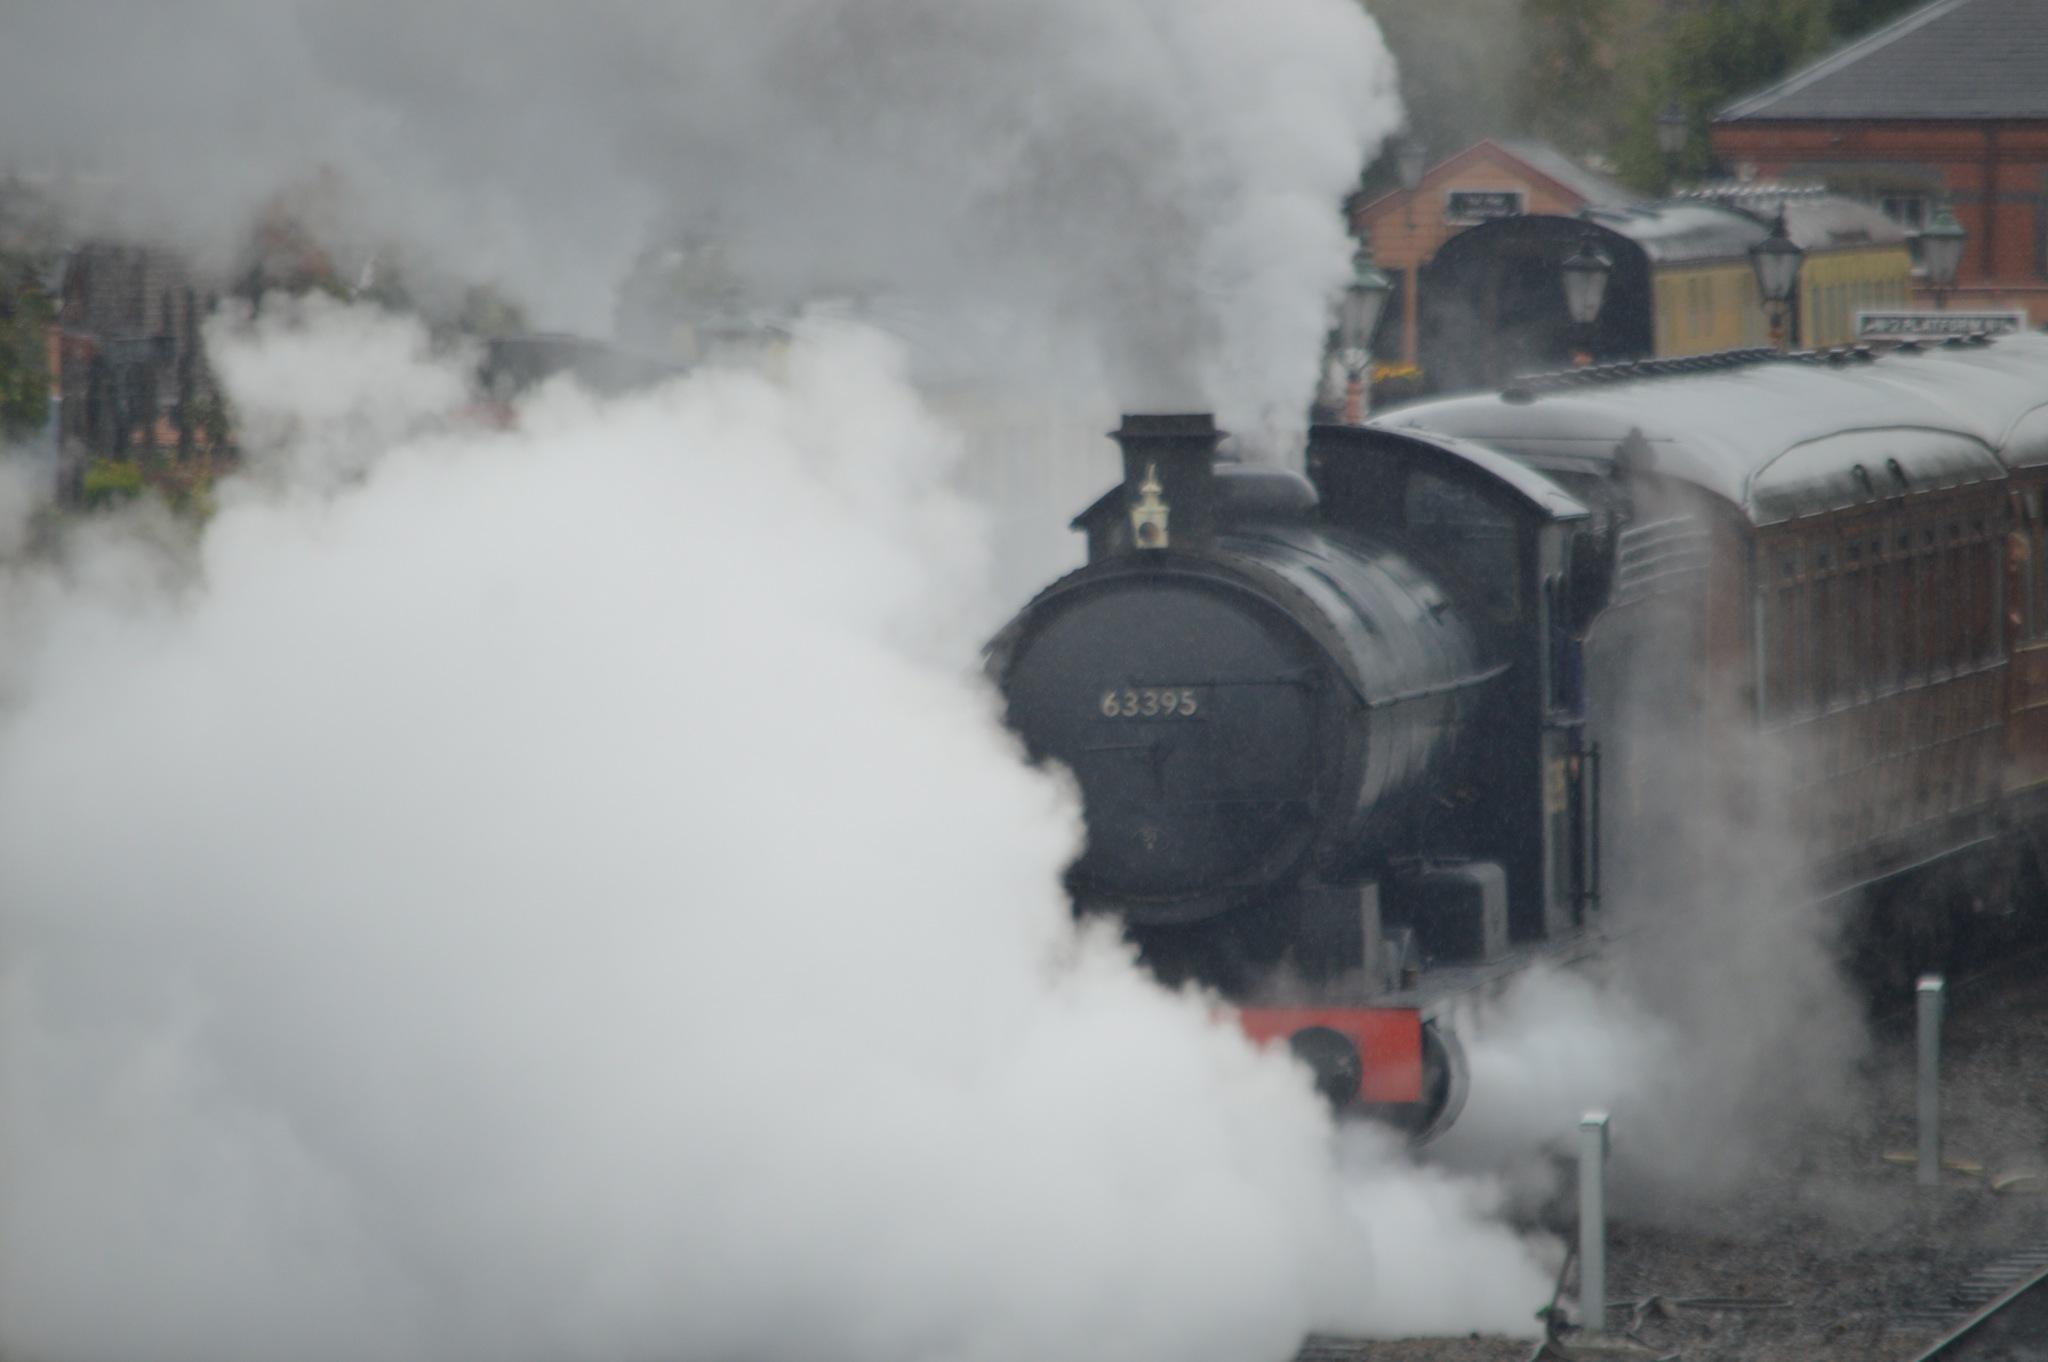 through the steam by adrian.williams.58323